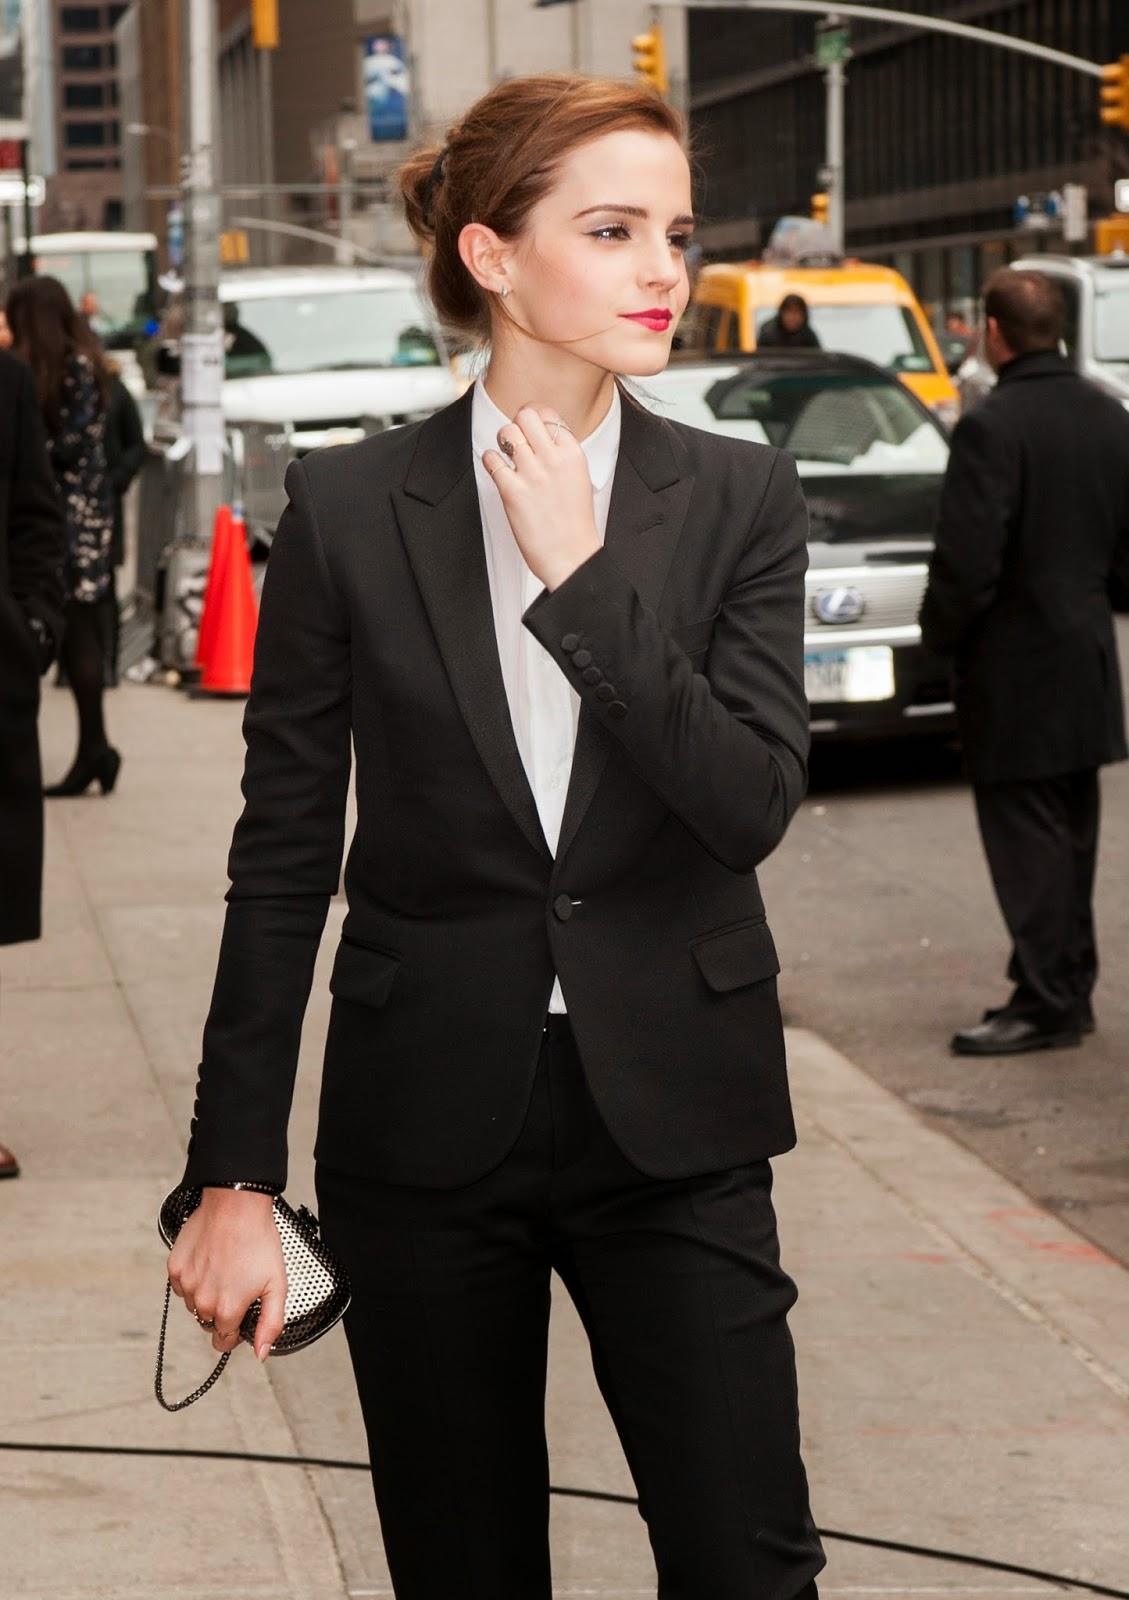 Hot Photos of Emma Watson.